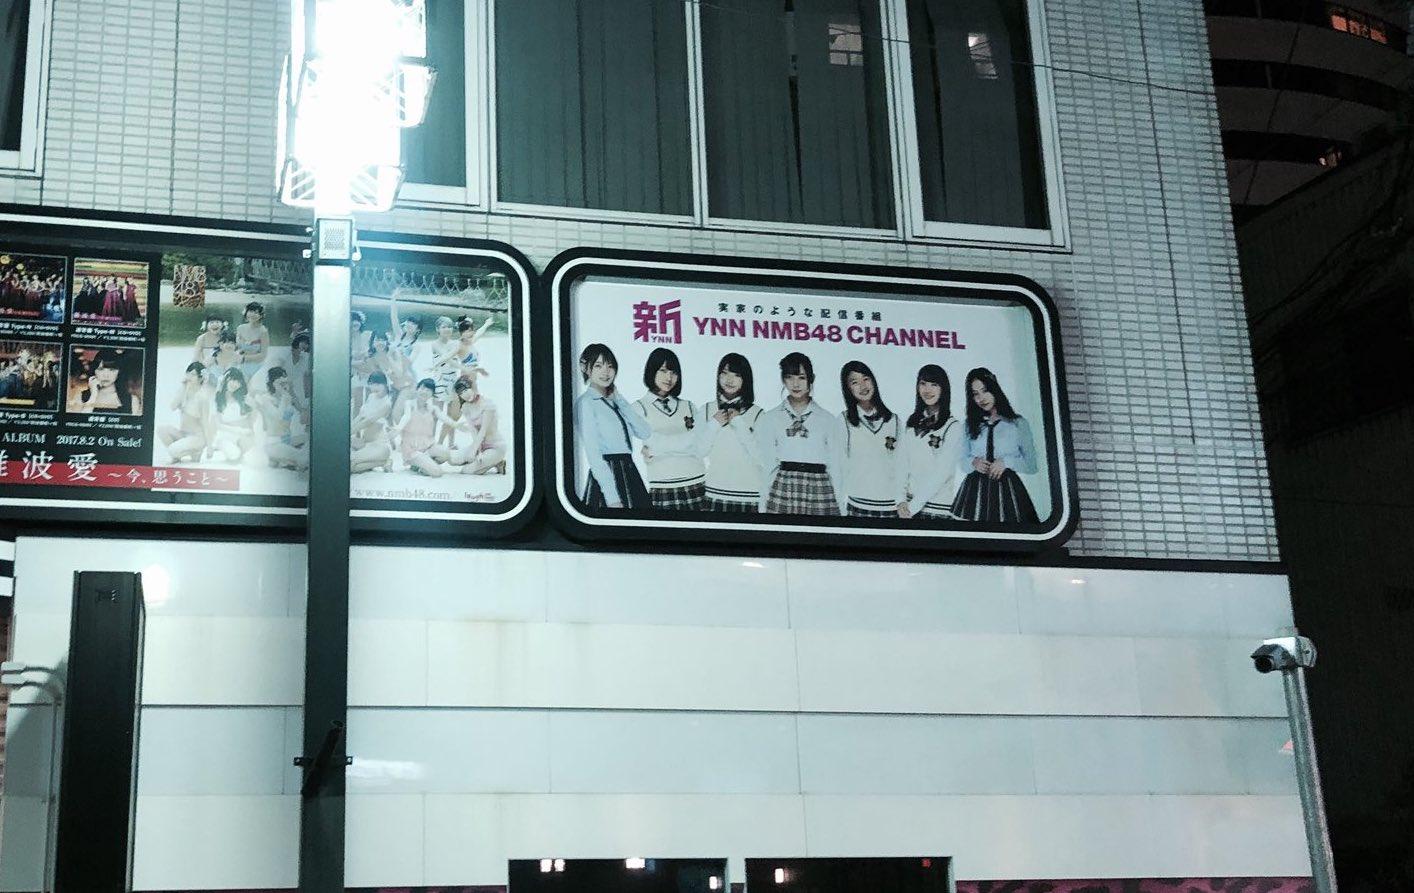 【NMB48】新YNN NMB48 CHANNELの看板がリニューアル。「実家のような配信番組」